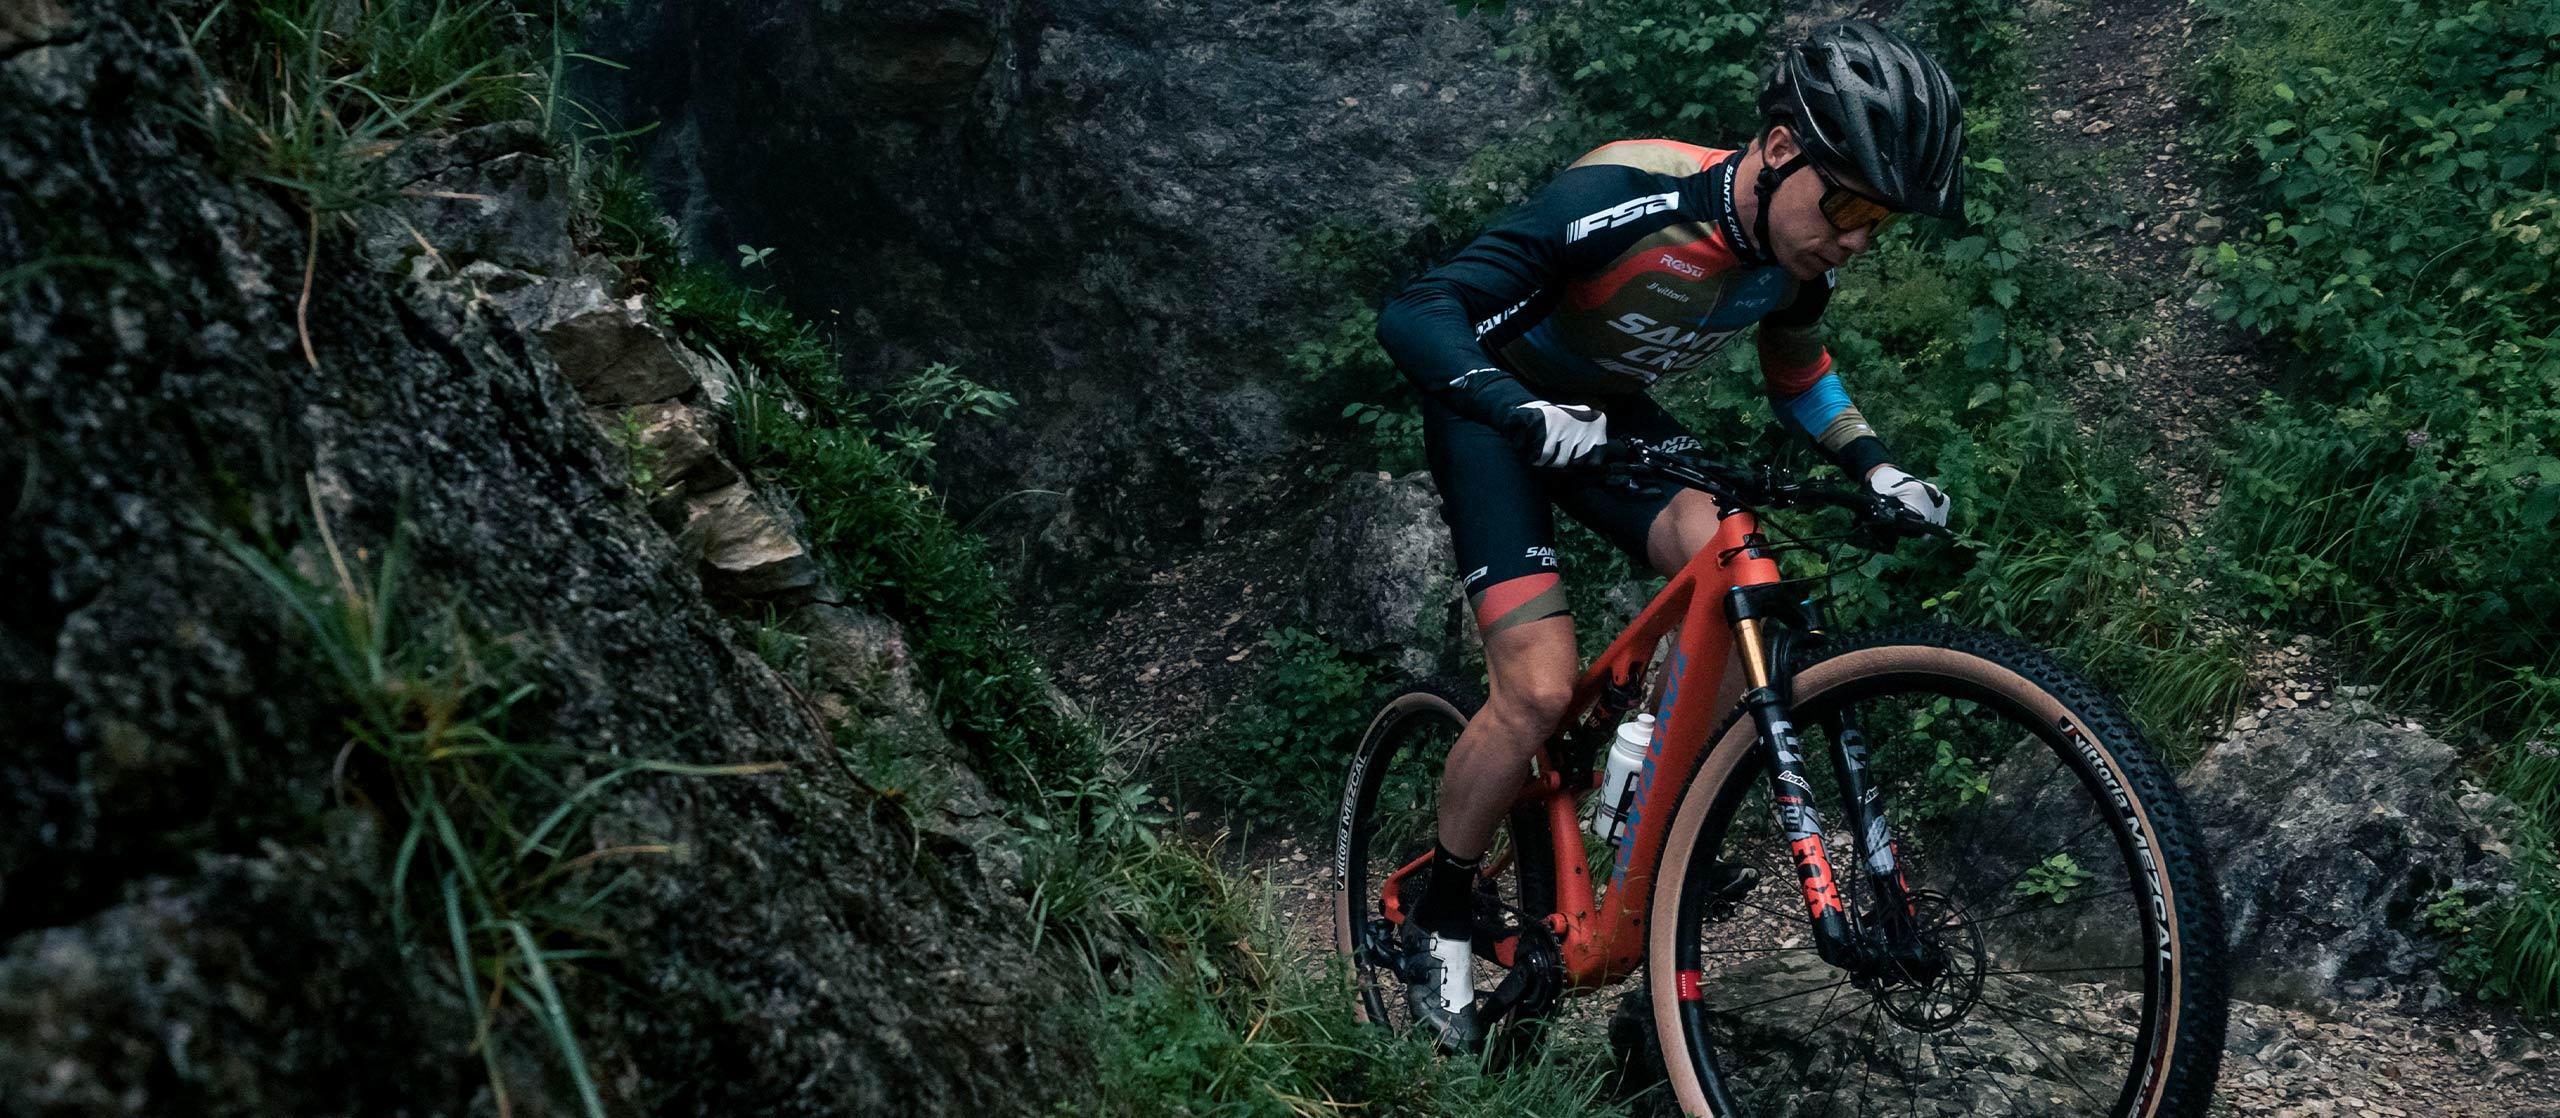 MET Veleno Mips Mountain Bike Helmet for Trail, XC and Gravel. Maxime Marotte MTB pro for Santa Cruz Fsa.